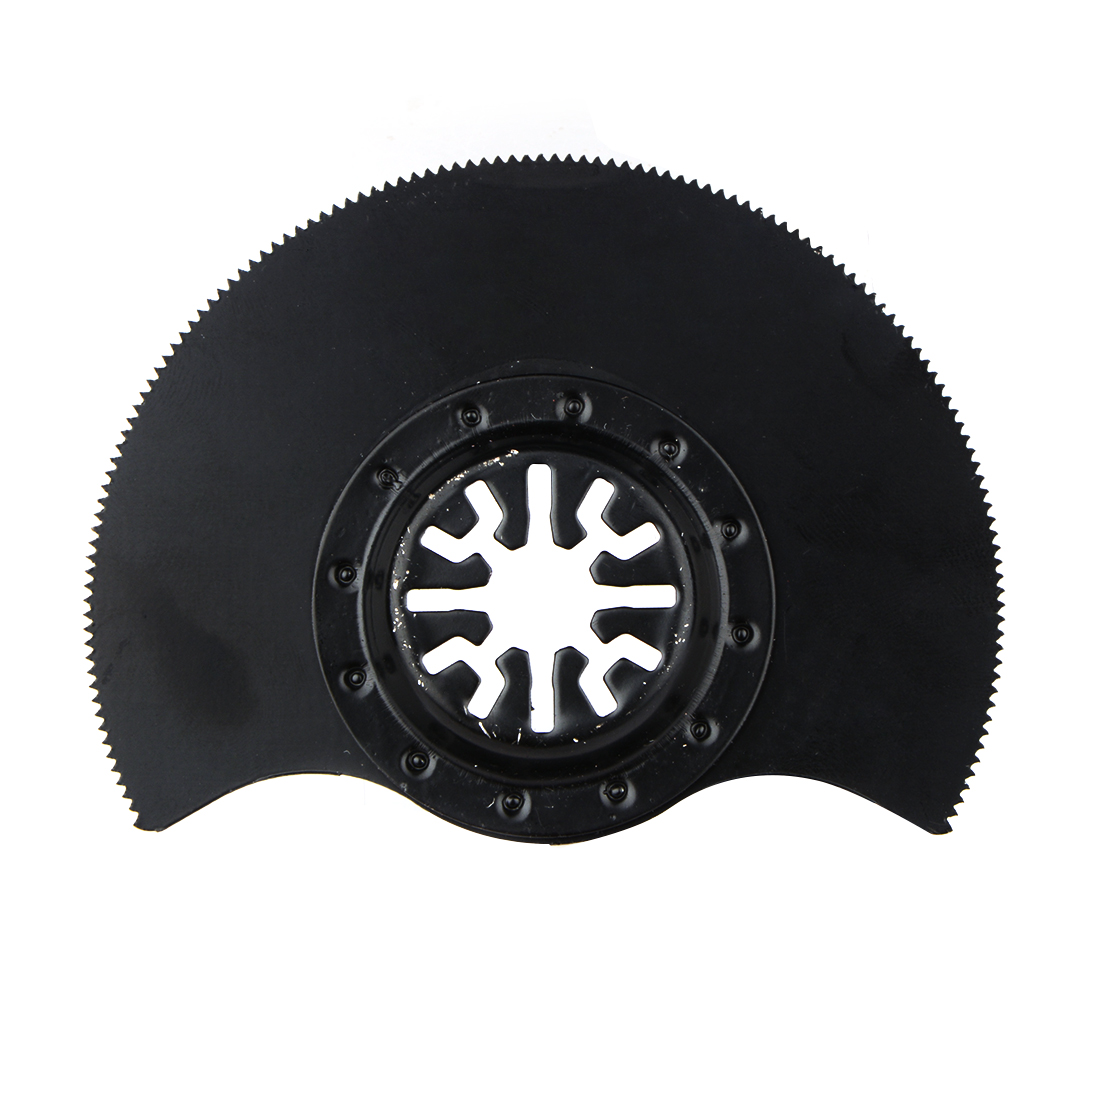 88mm Semi-circular Oscillating Saw Blade HCS For Multimaster Fein Makita Decker Wood Cutting Tools